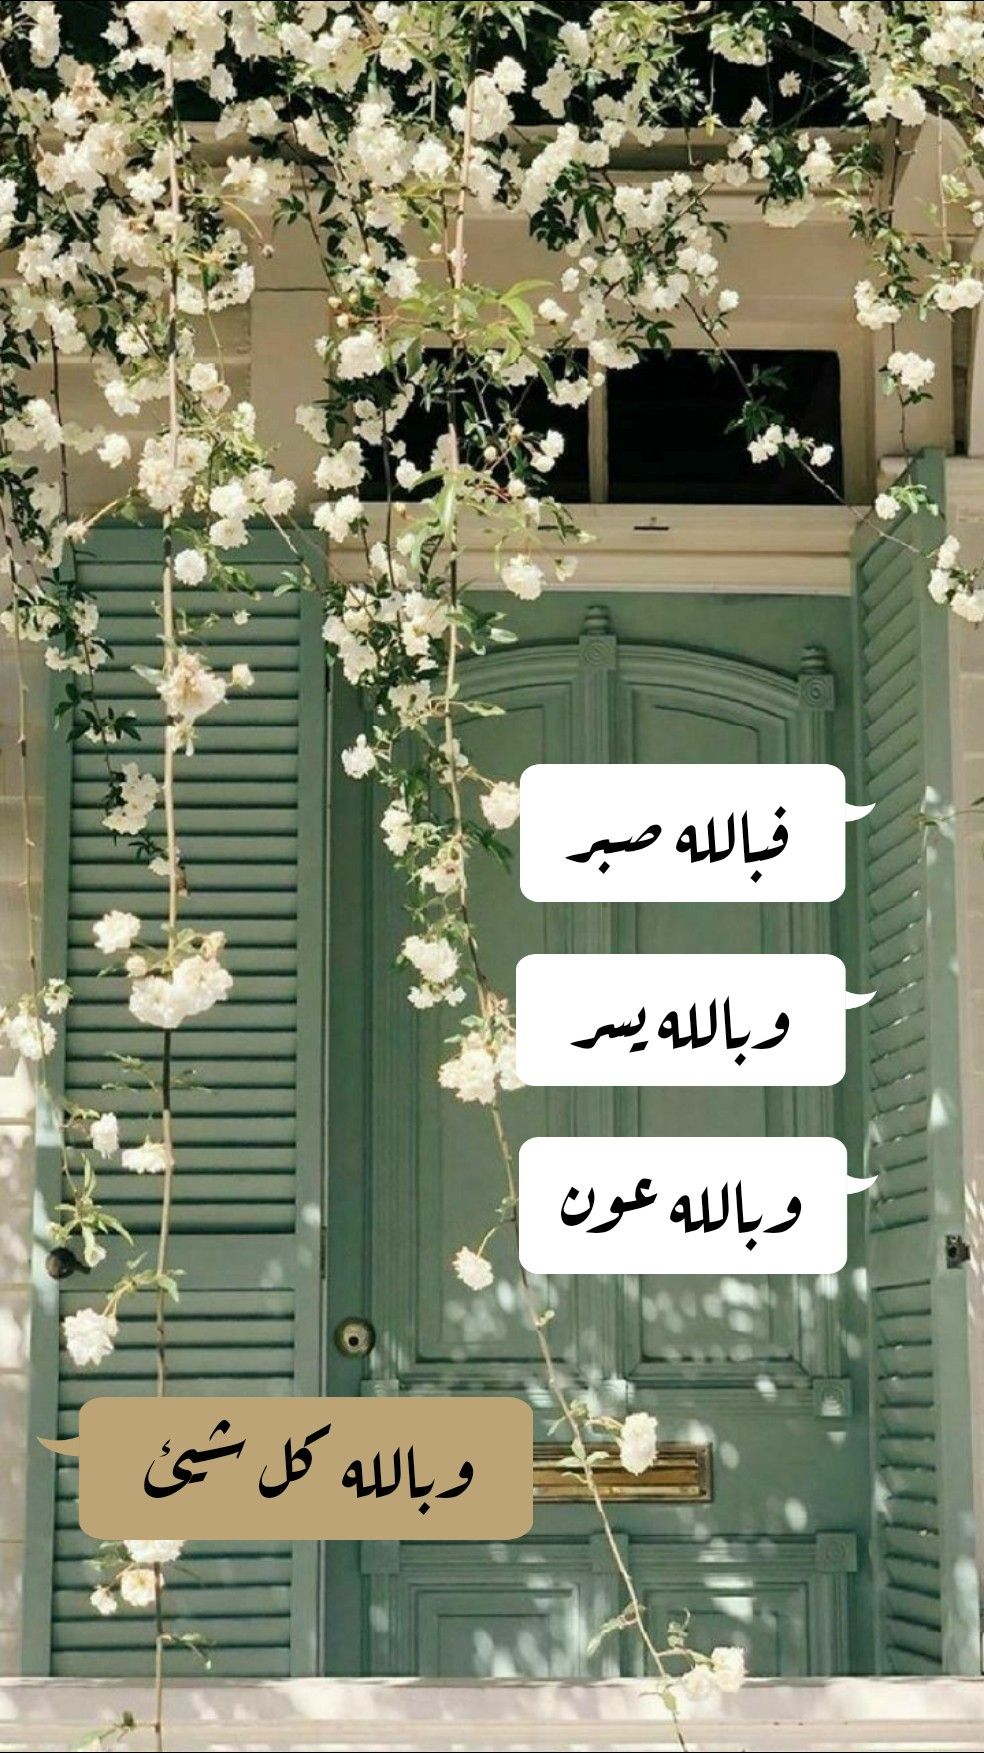 وبالله كل شيء Islamic Quotes Wallpaper Iphone Wallpaper Quotes Love Beautiful Quran Quotes